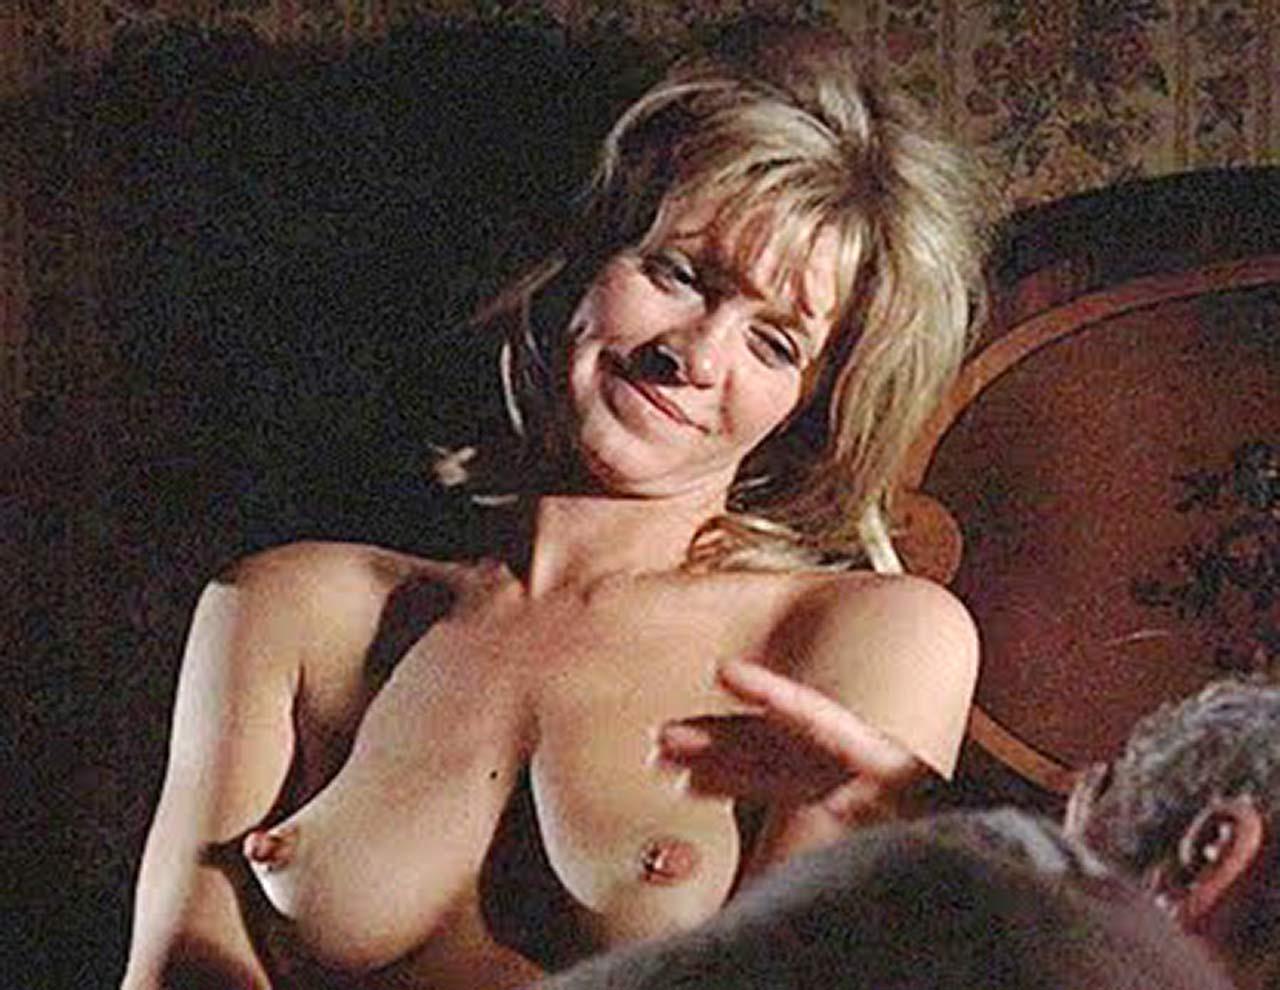 Nancy travis nude pics